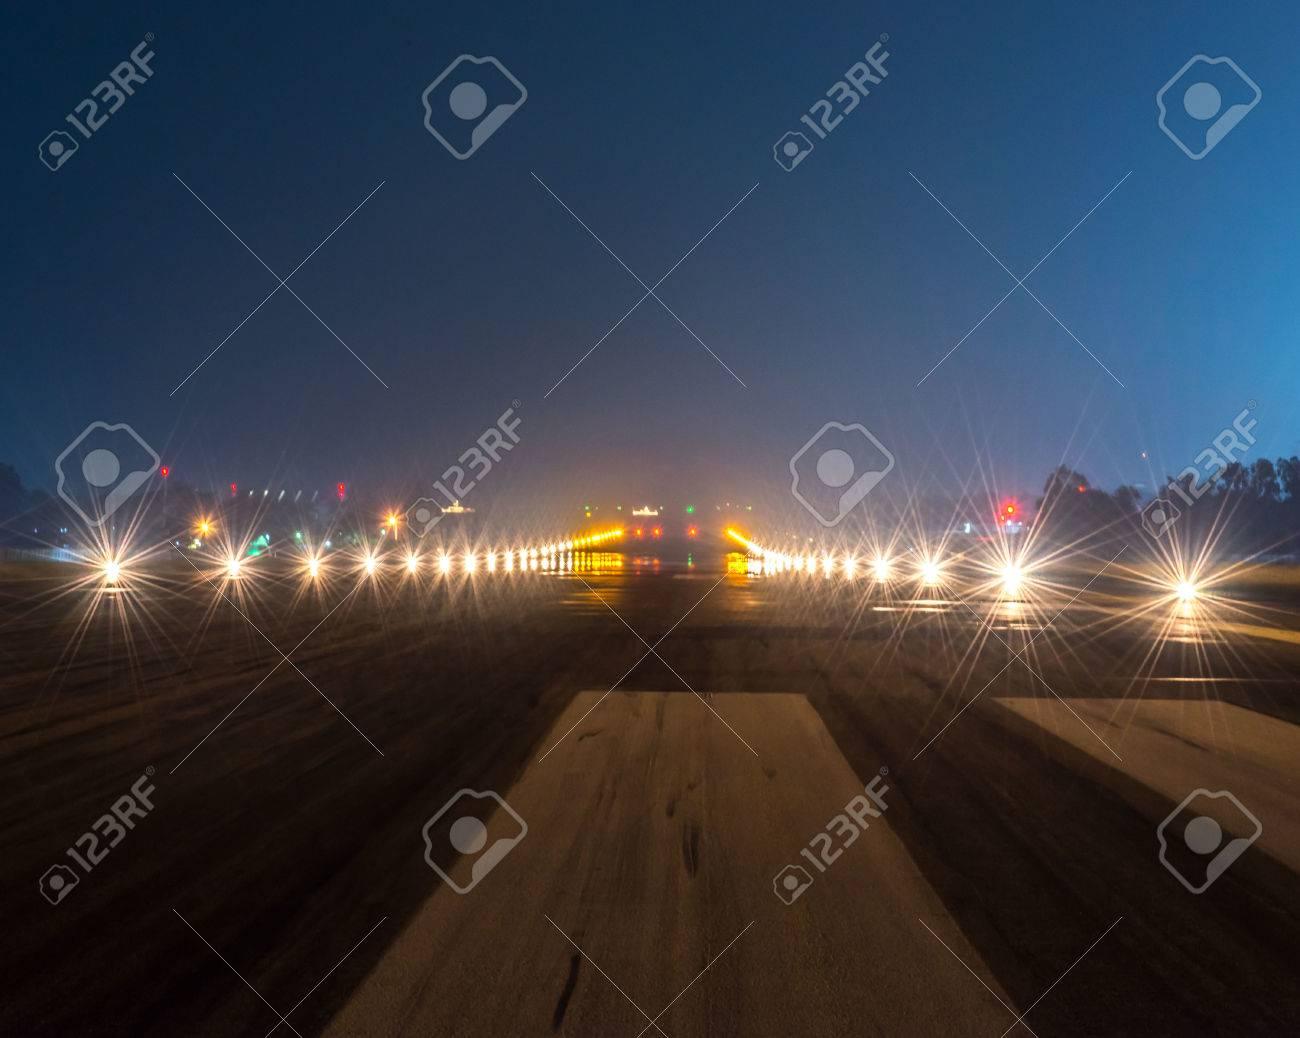 Landing lights at night closeup. - 48539421